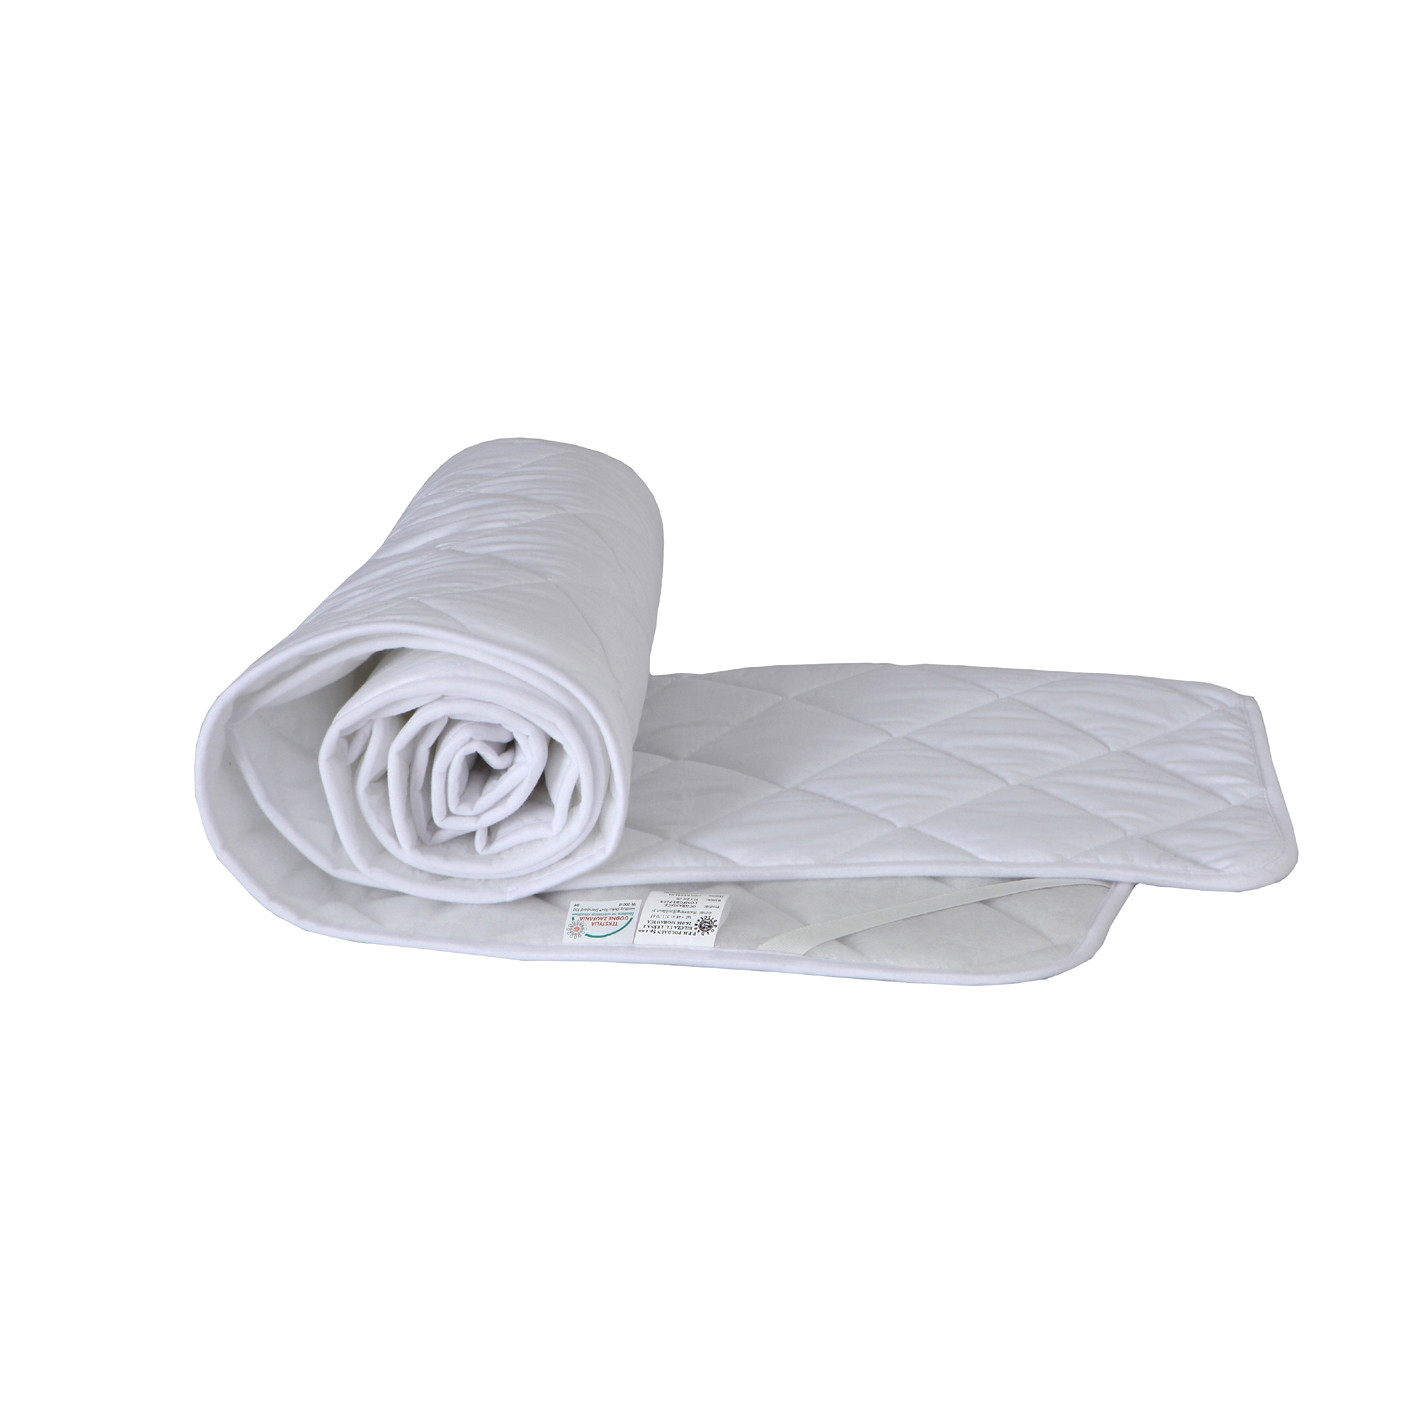 Ochraniacz na materac Comfort Plus 180x200